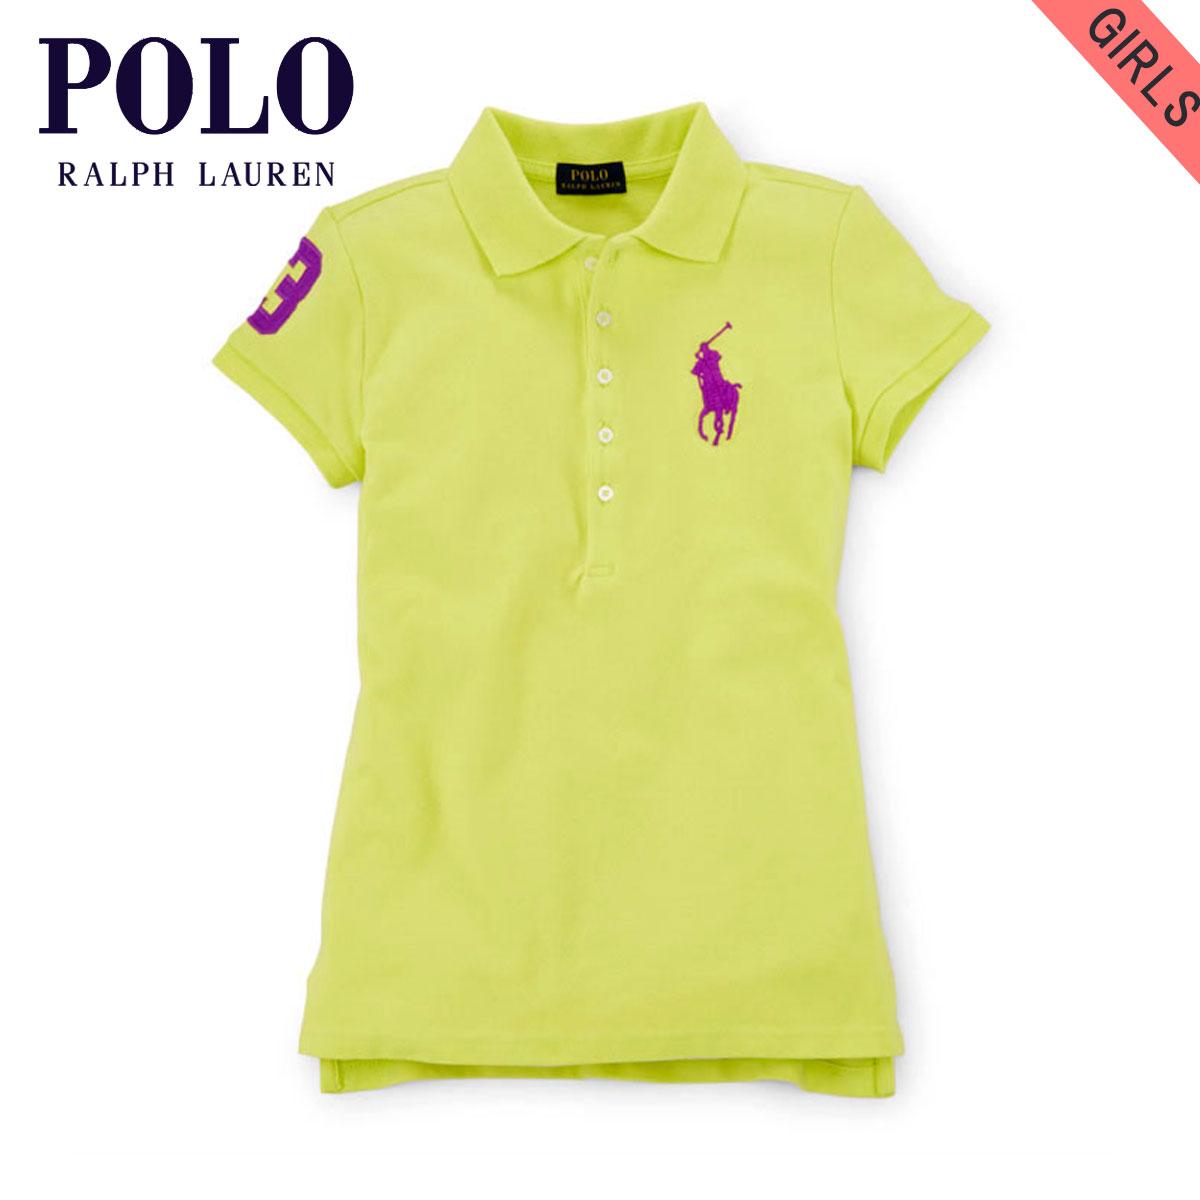 15db783674e8 Poloralflorenkids POLO RALPH LAUREN CHILDREN genuine kids clothing girls  polo shirt BIG PONY STRETCH COTTON POLO 70069556 10P09Jan16